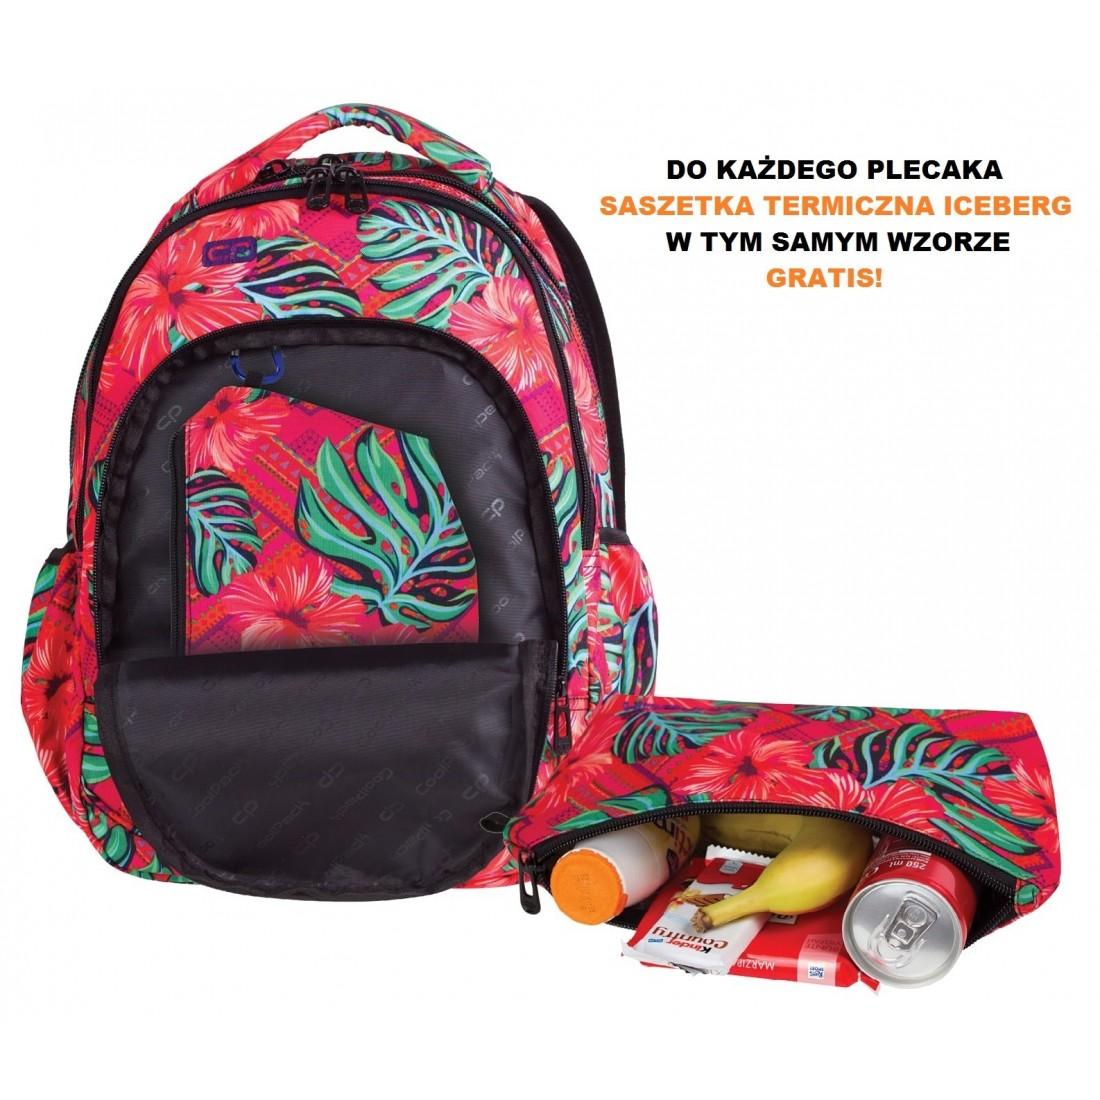 4dc5088964605 ... CoolPack CP PRIME BOHO ELECTRA Aztec Boho plecak dla pierwszoklasisty azteckie  wzory cooler bag - 1061 ...